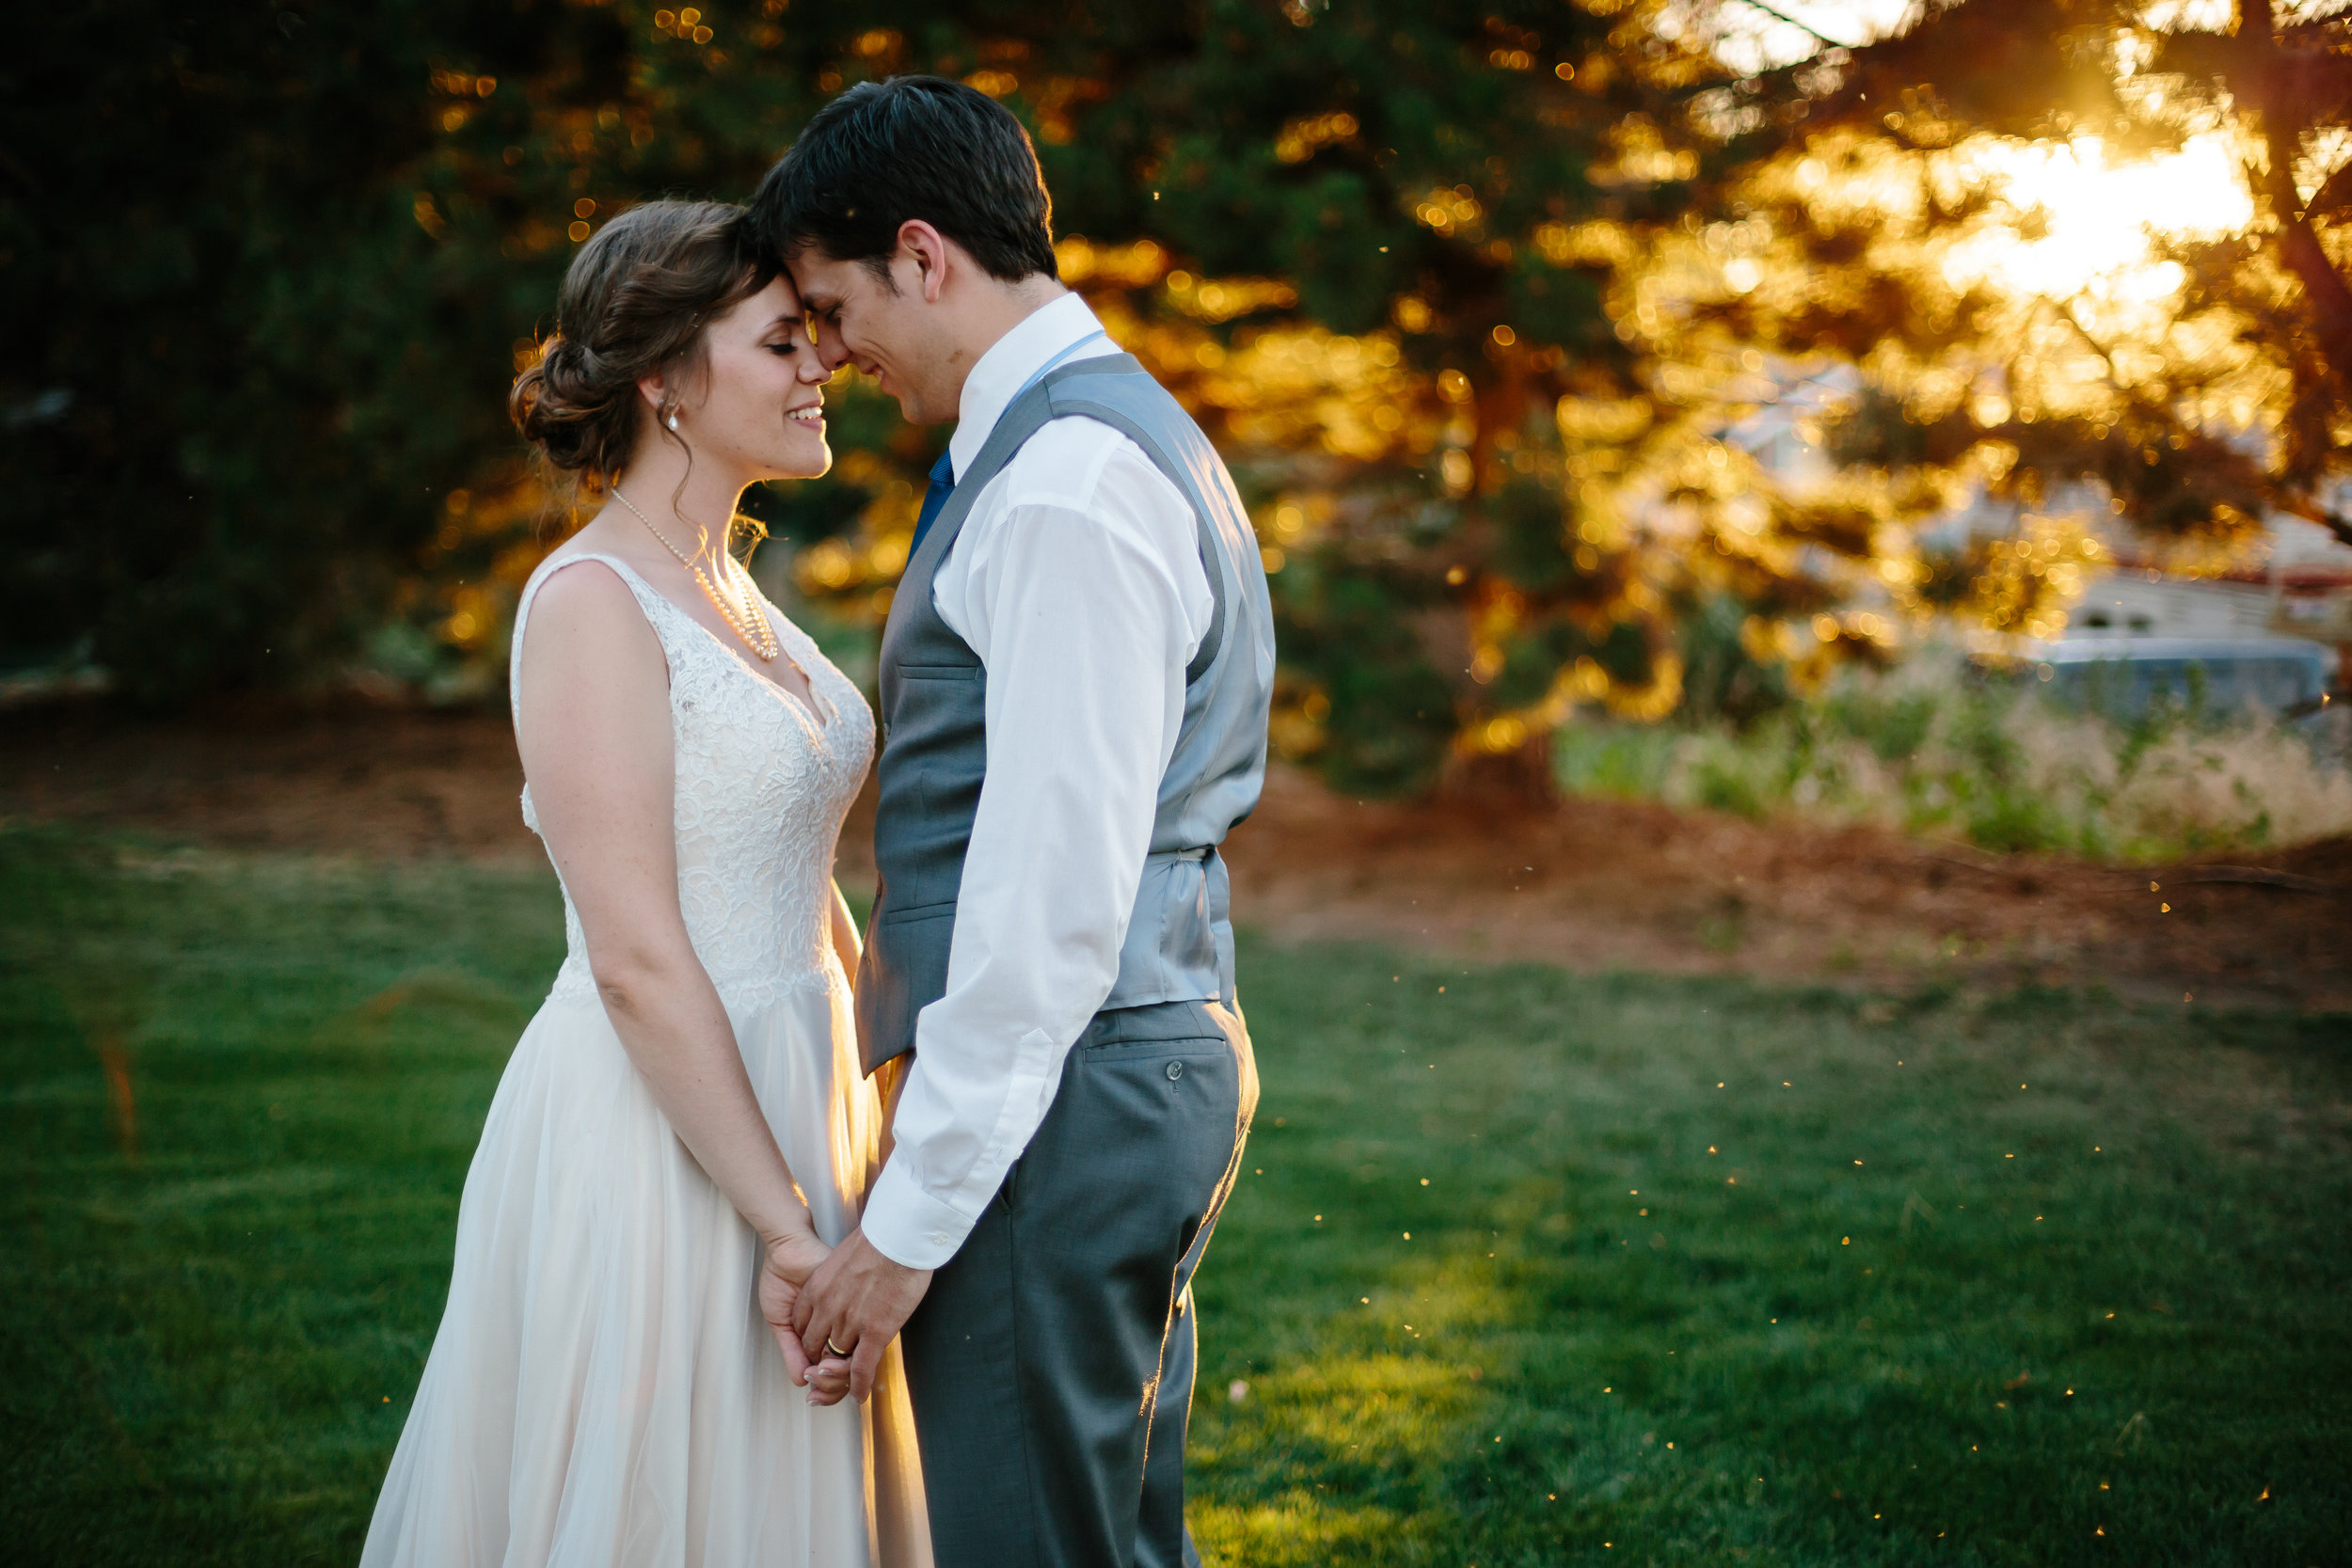 Jordan & Shantel Married - Idaho - Corrie Mick Photography-191.jpg